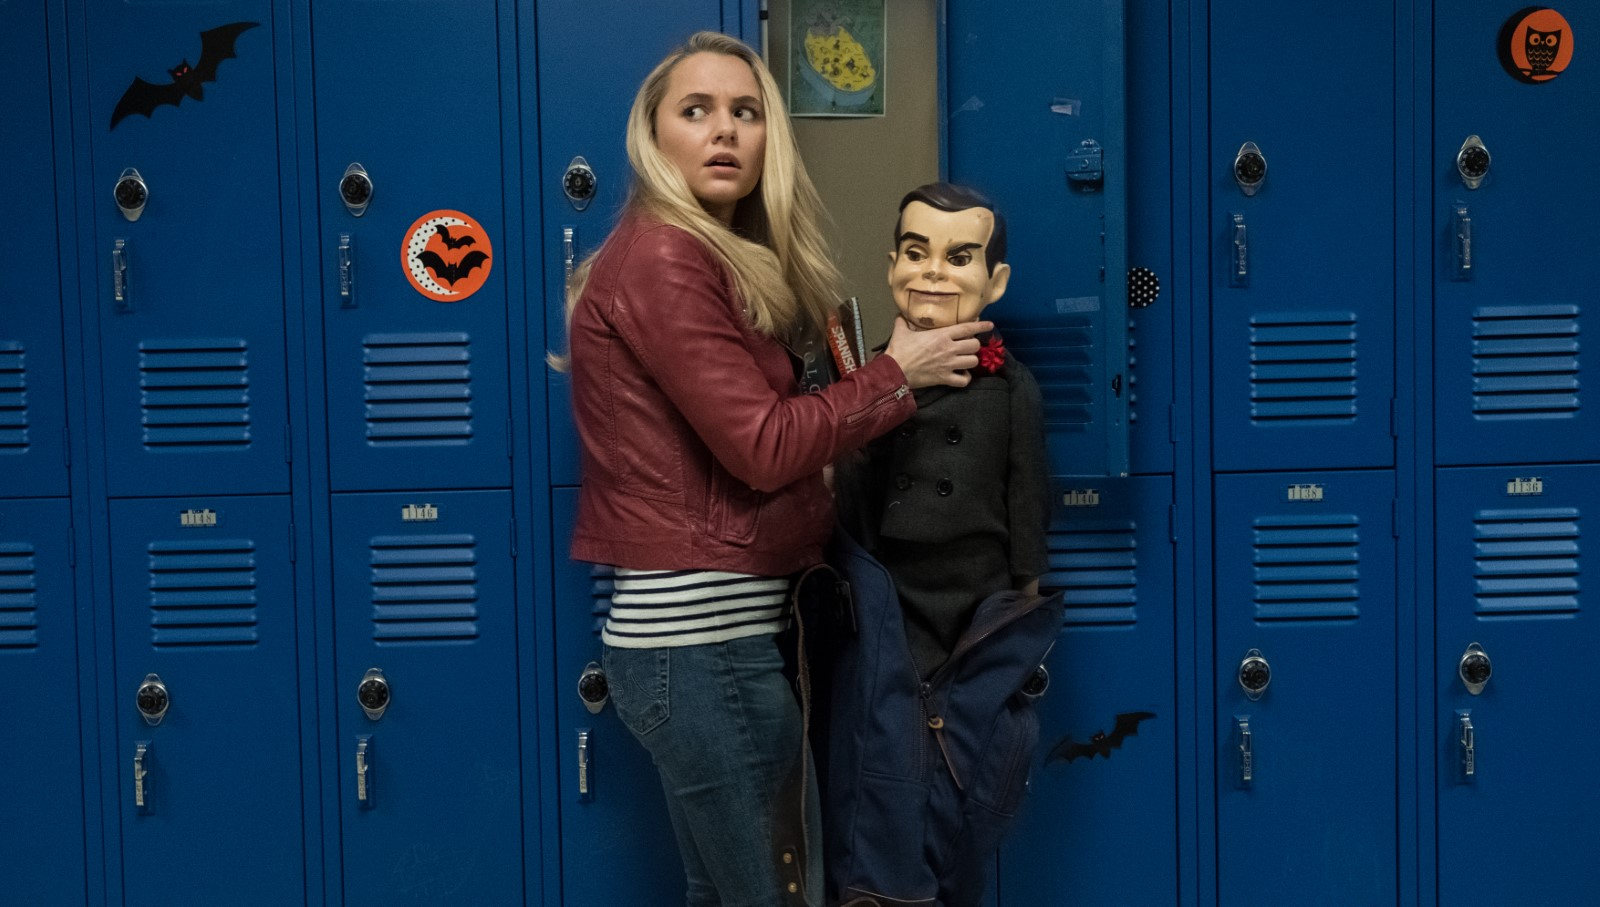 Mick Wingert and Madison Iseman in Goosebumps 2: Haunted Halloween (2018)